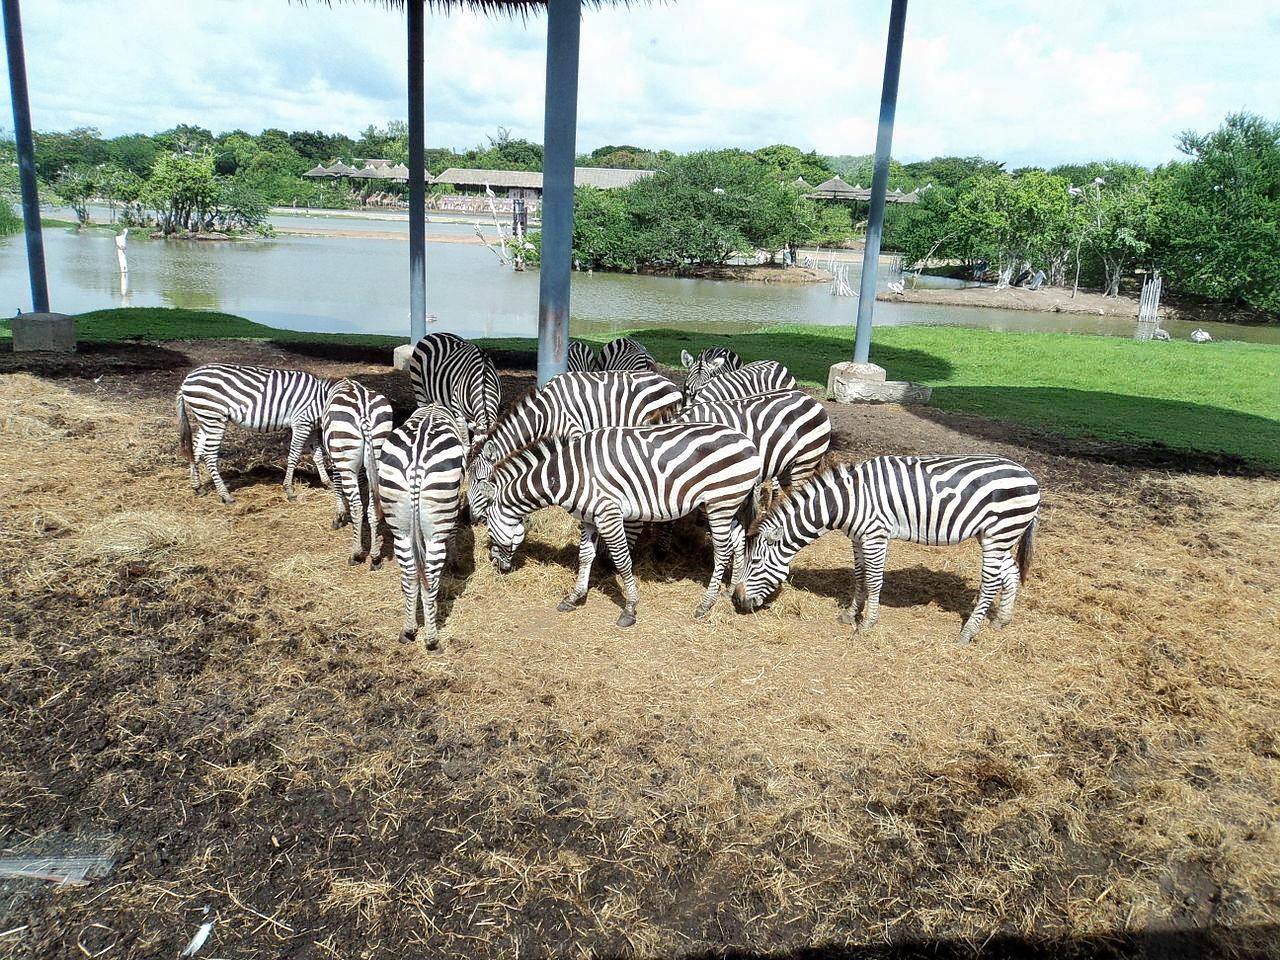 1464945434_zebras-_safari-_bangkok.jpg